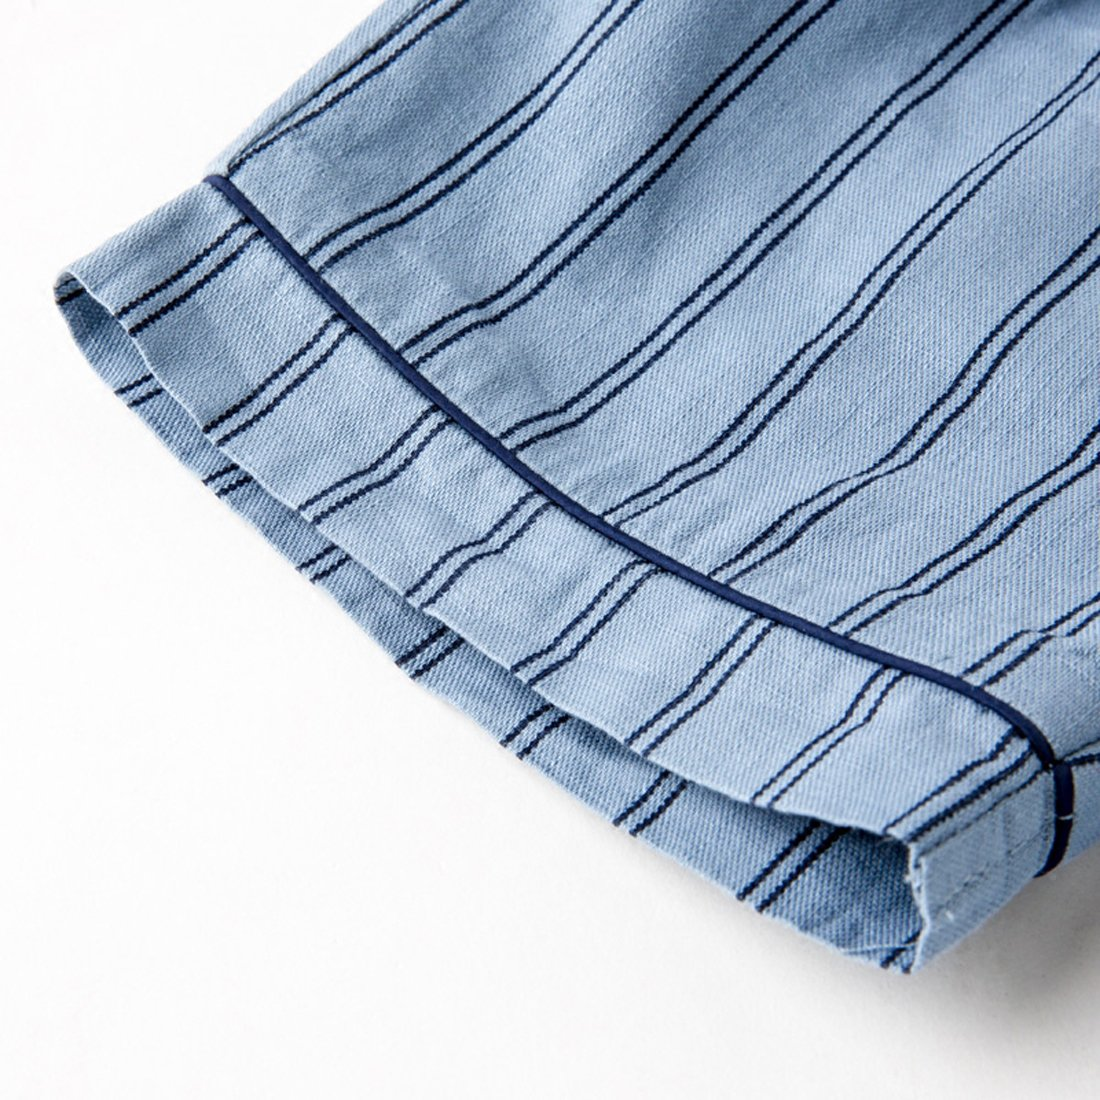 PAUBOLI Boys Button Down Pajamas Set Short Sleeve Organic Cotton Striped Sleepwear Loungewear (6-7 Years) by PAUBOLI (Image #5)